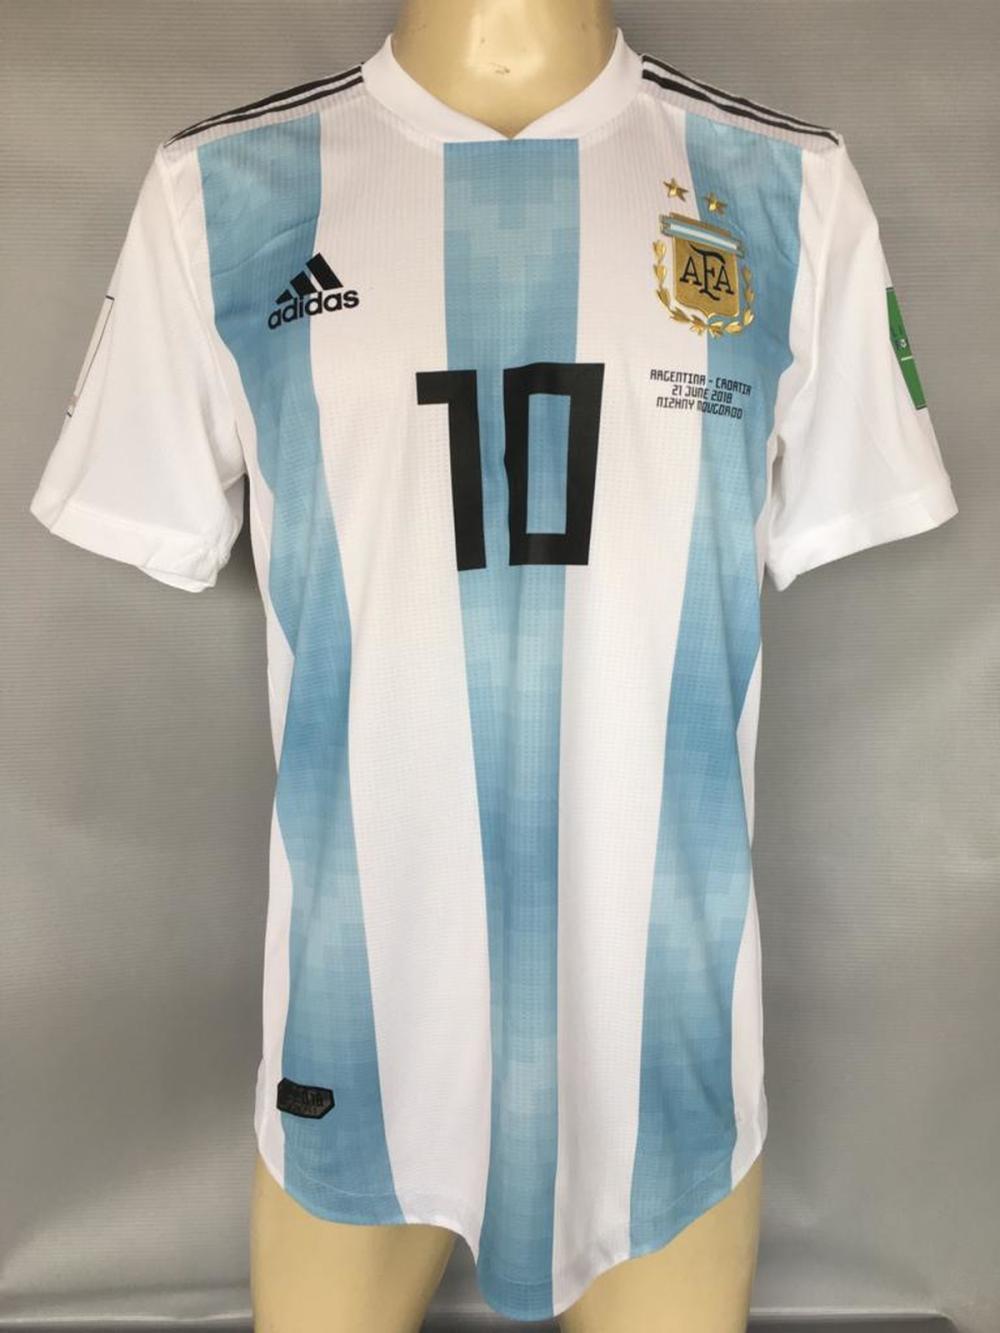 reputable site f3bbf db163 Argentina #10 Messi Match Worn Shirt World Cup 2018 x Croati